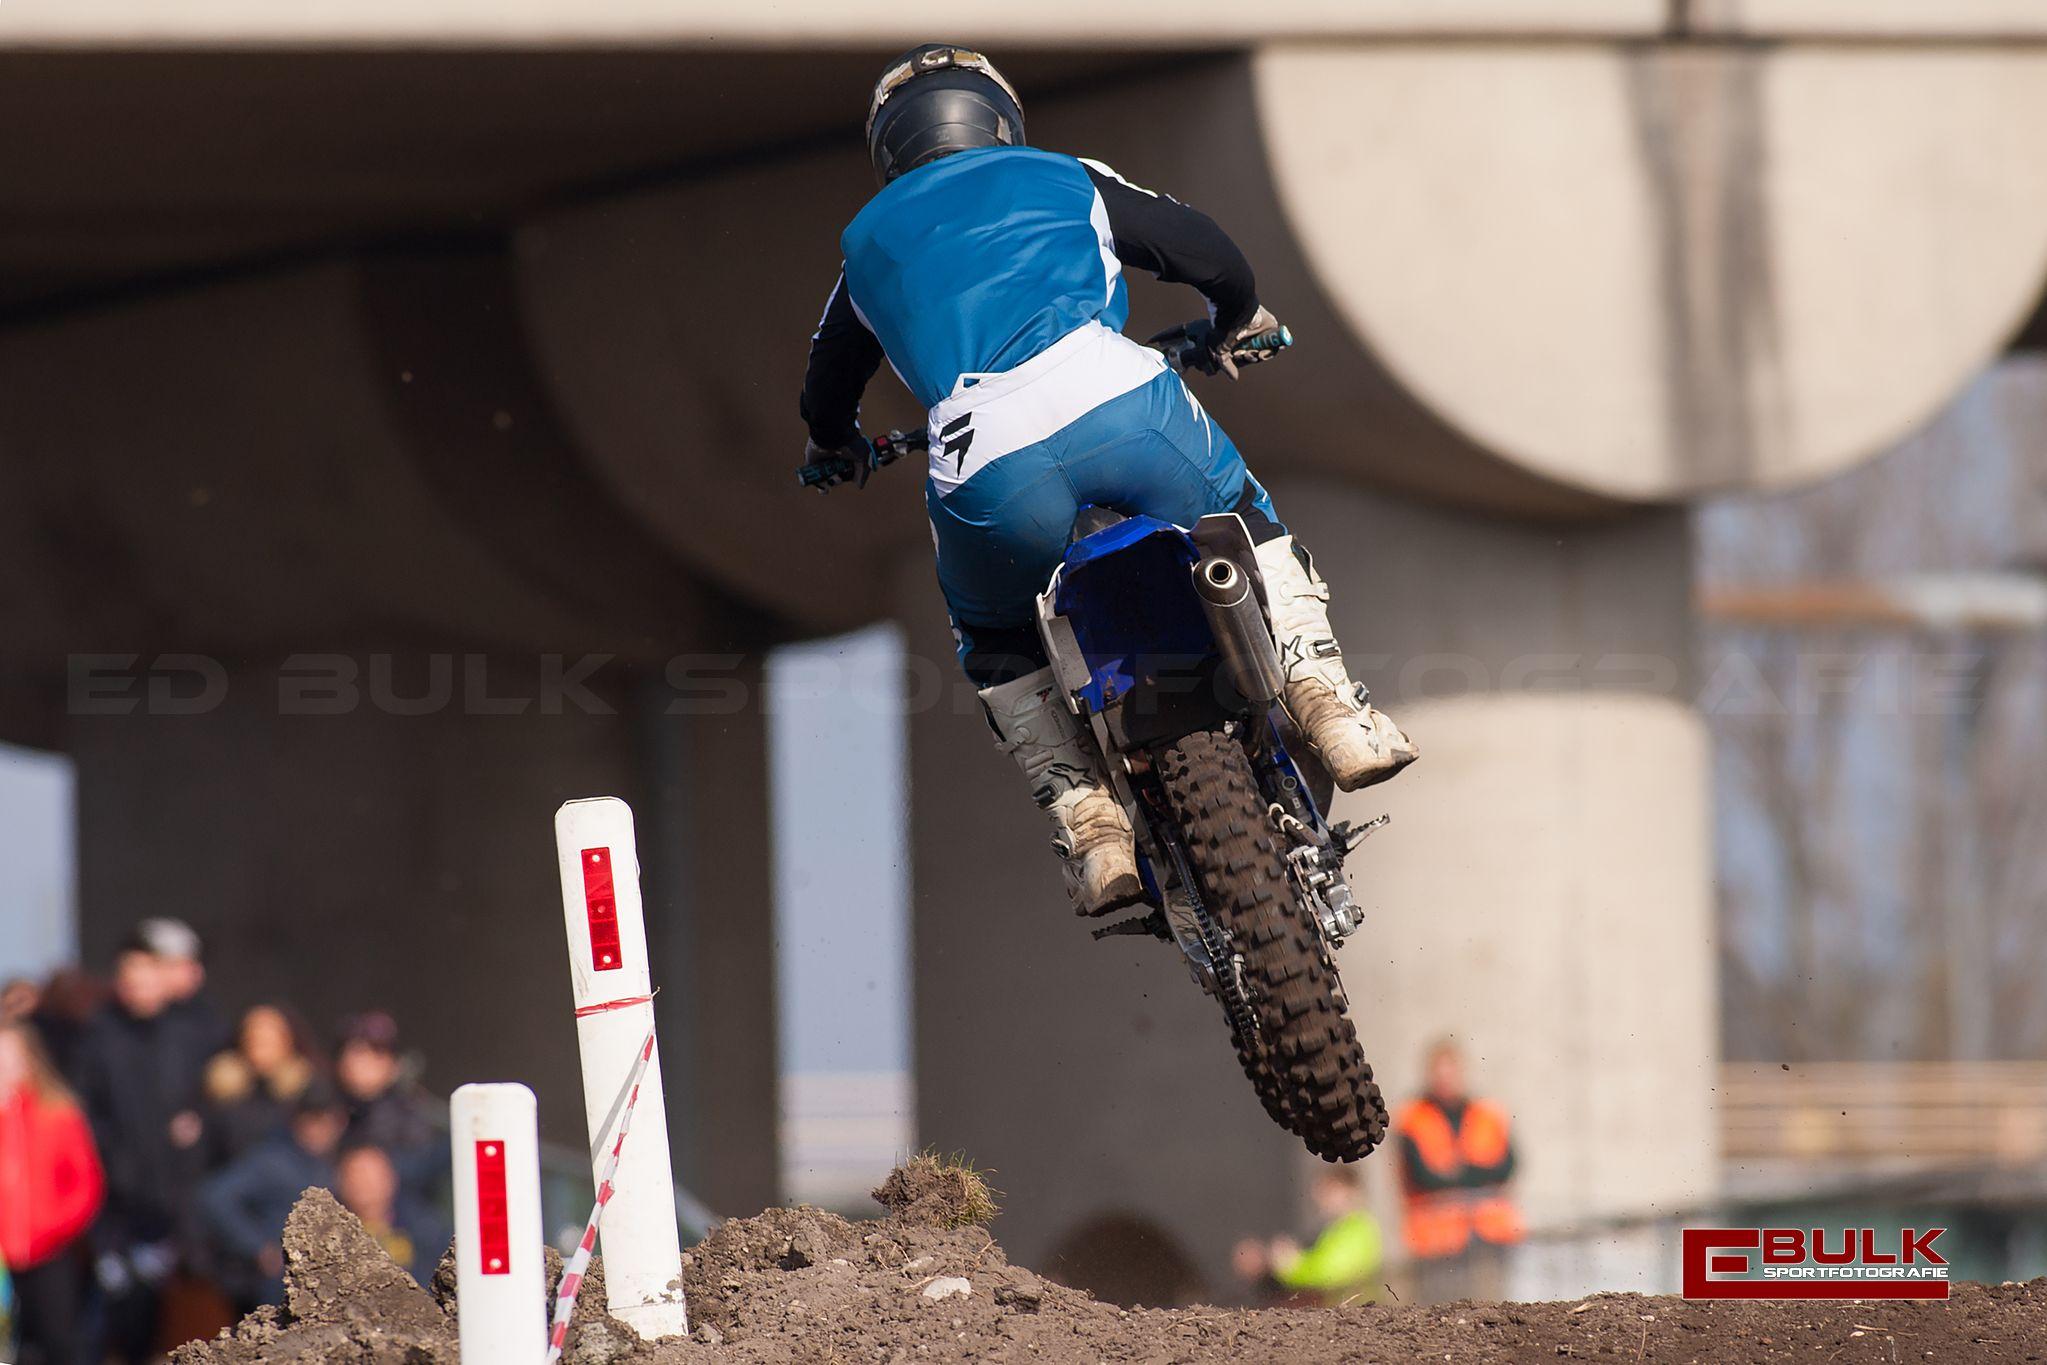 ebs_0115-ed_bulk_sportfotografie